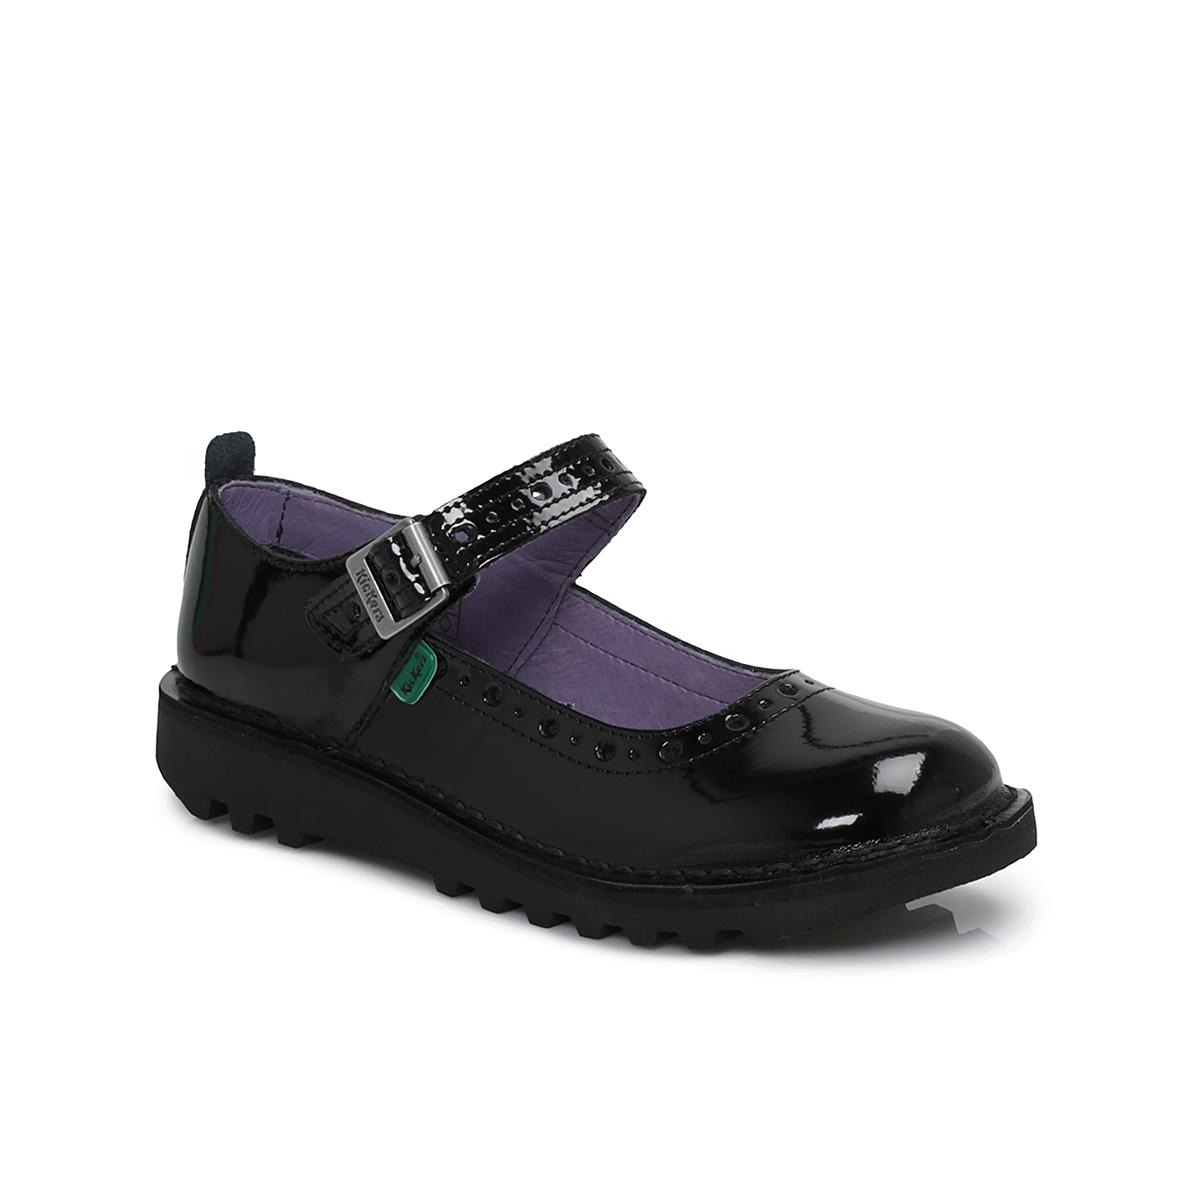 Black kicker sandals - Kickers Junior Kick Bar Brogue Patent Black Leather Kids Shoes Size 31 35